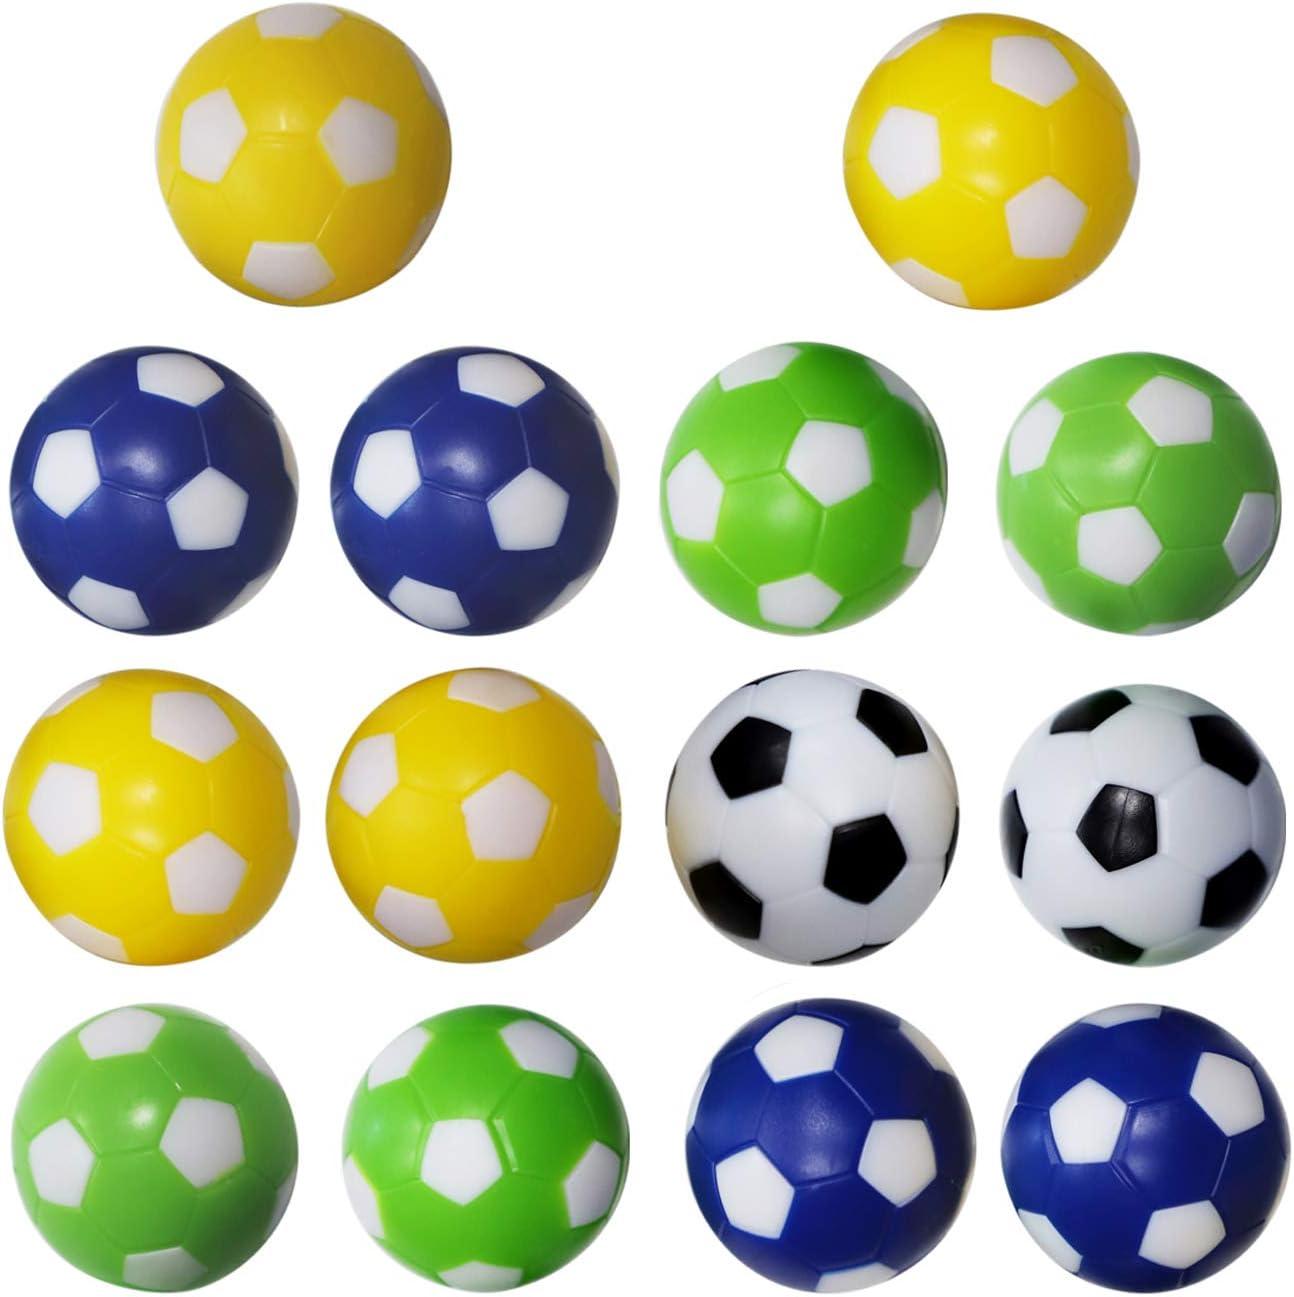 36mm Foosball Replacement Balls 14 Pack NONE BRAND Zdgao Foosball Balls Table Soccer Balls 1.4